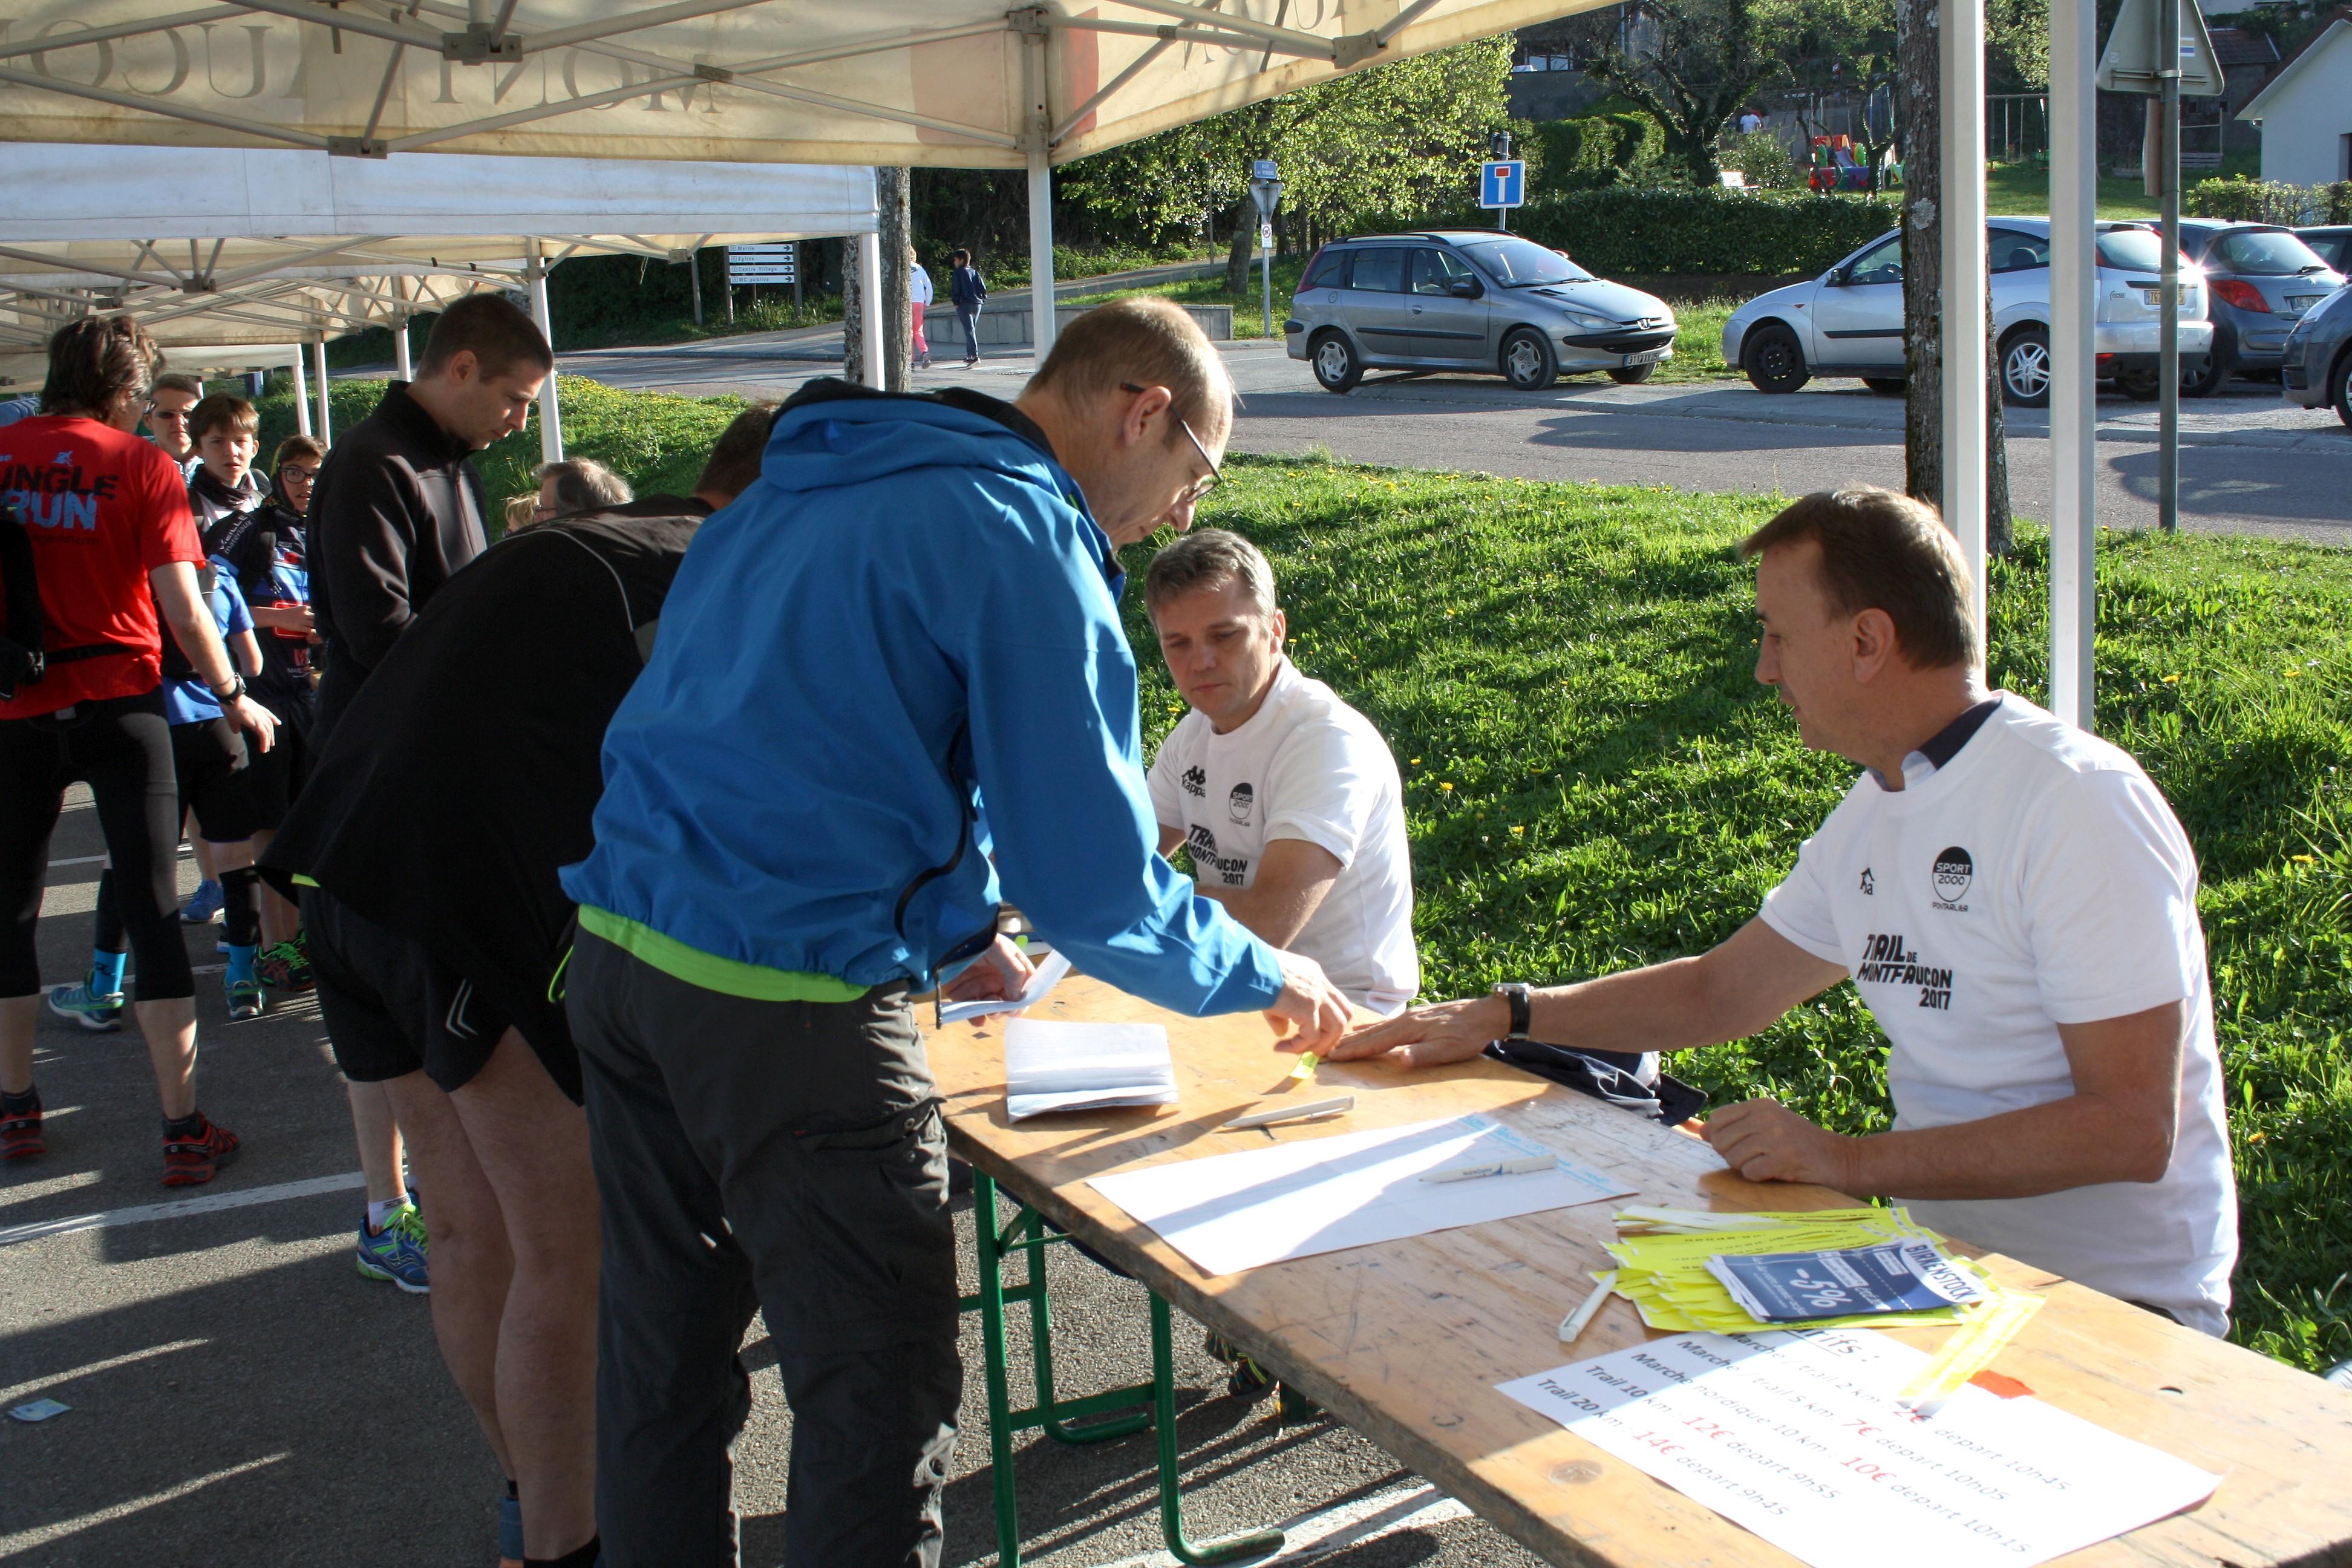 2017-04-09 - Trail-Montfaucon (65)